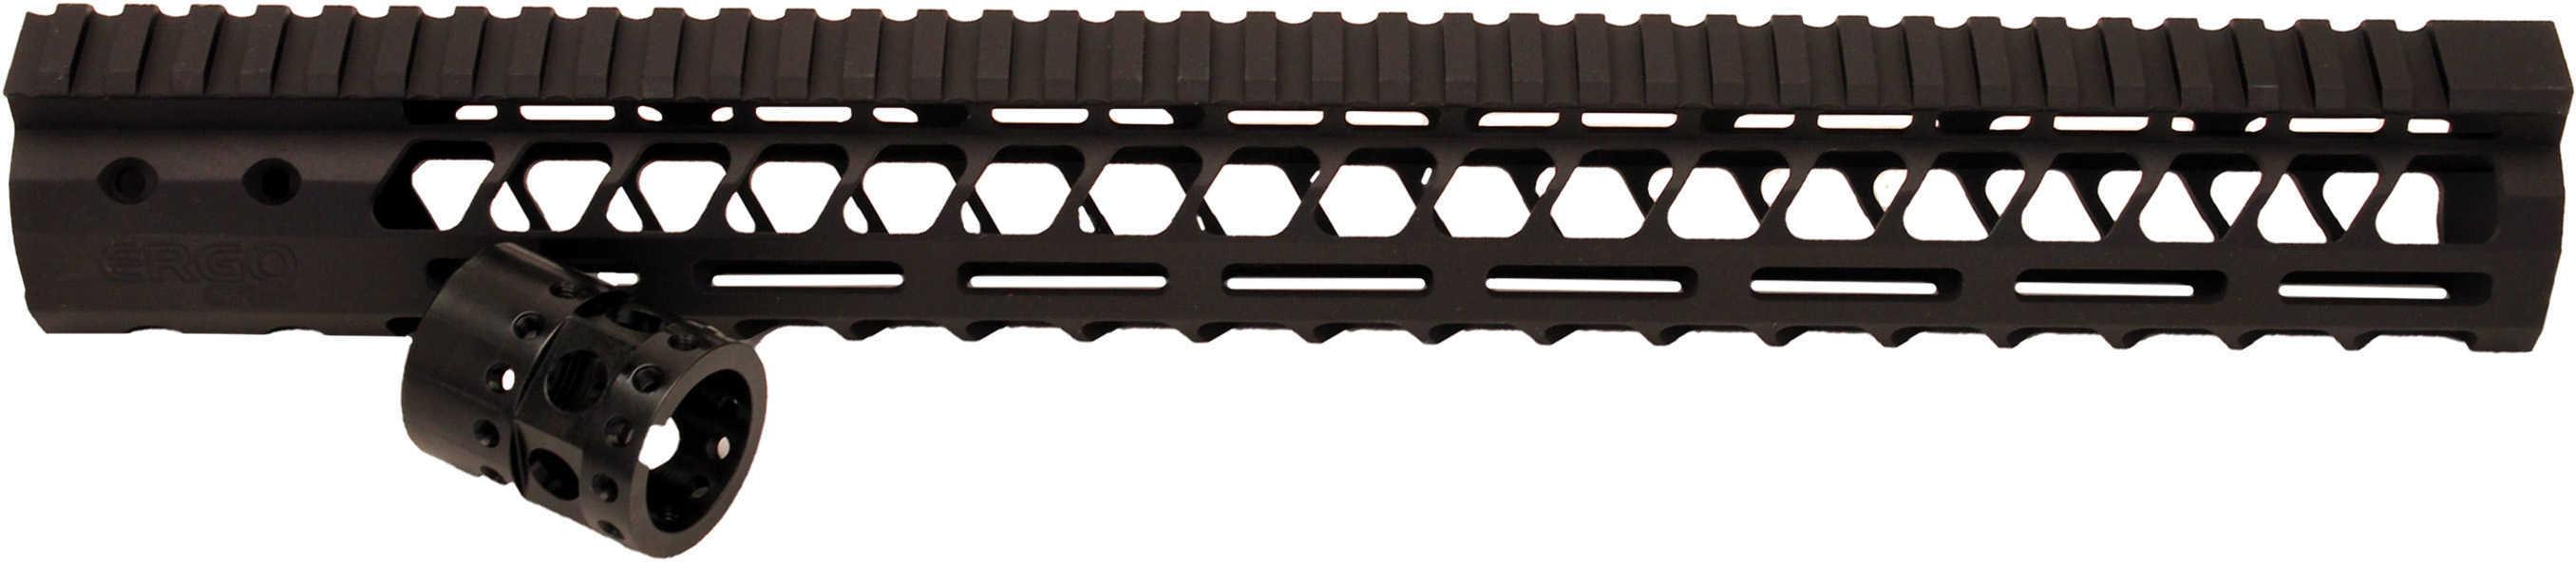 "Ergo Grip Superlite Modular M-LOK Rail Fits AR/M4 15"" Black Finish 4820-15"